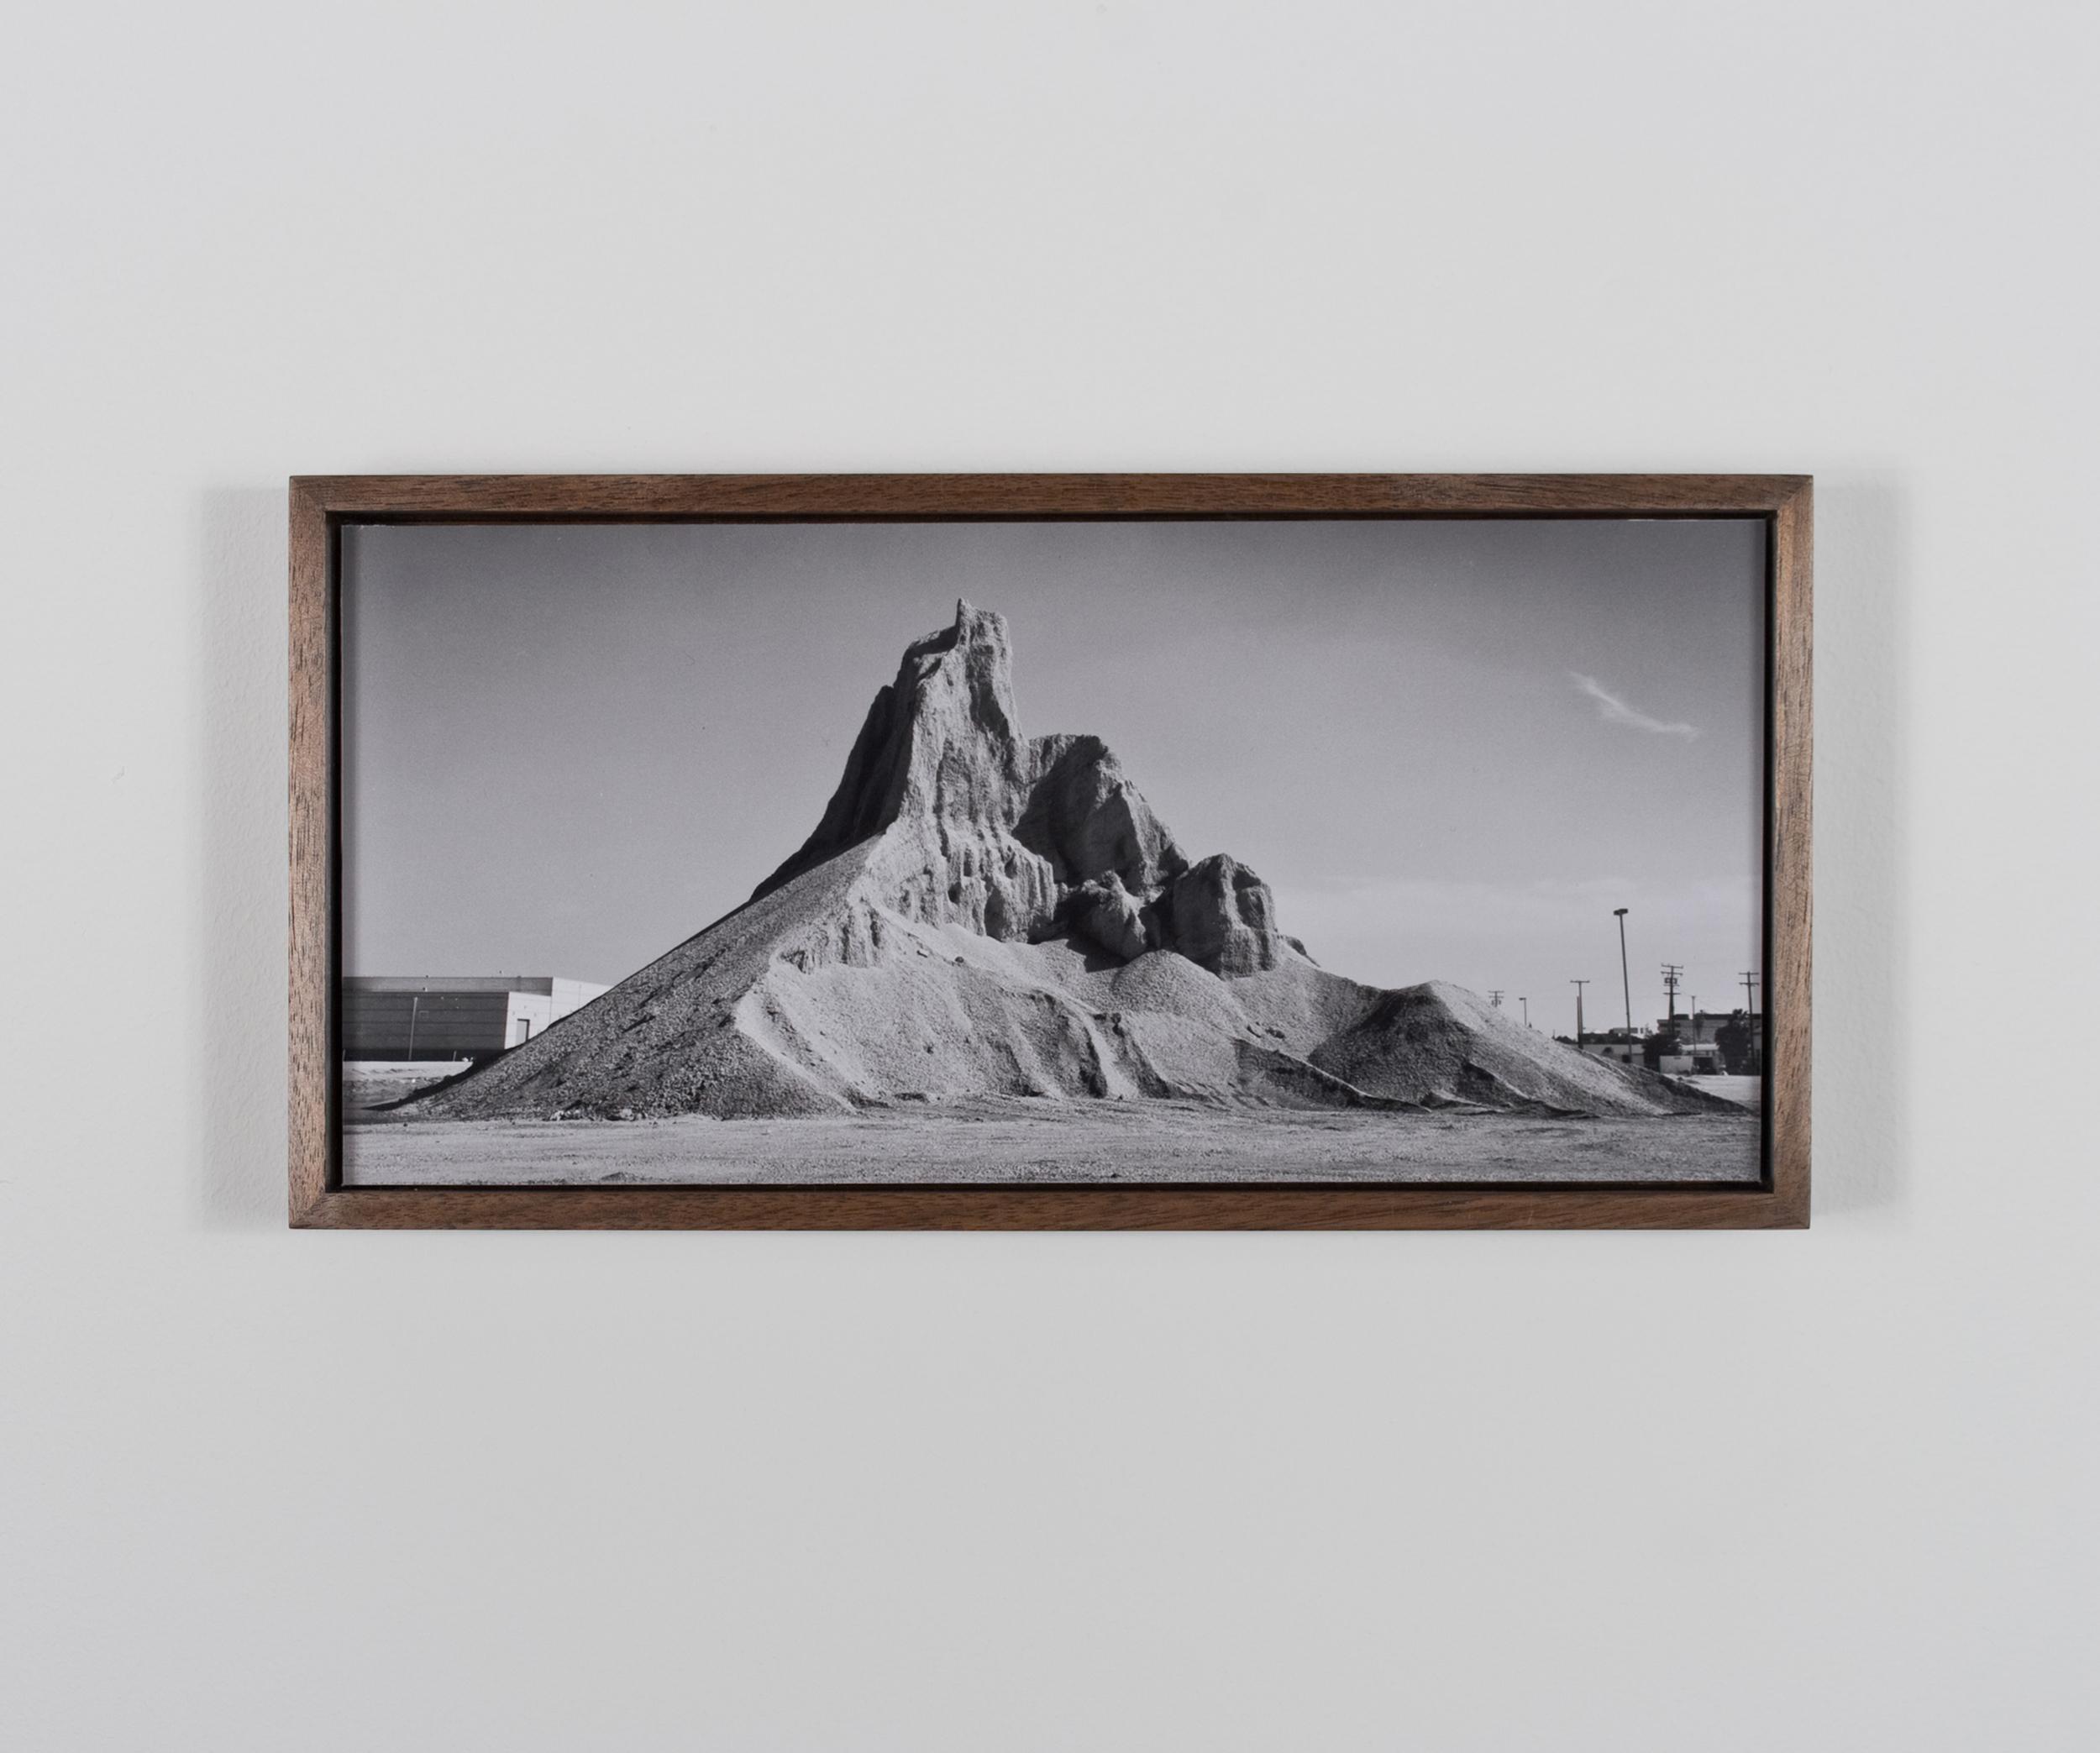 Widows Peak 2009/10 Gelatin-silver print on Dibond, with walnut frame